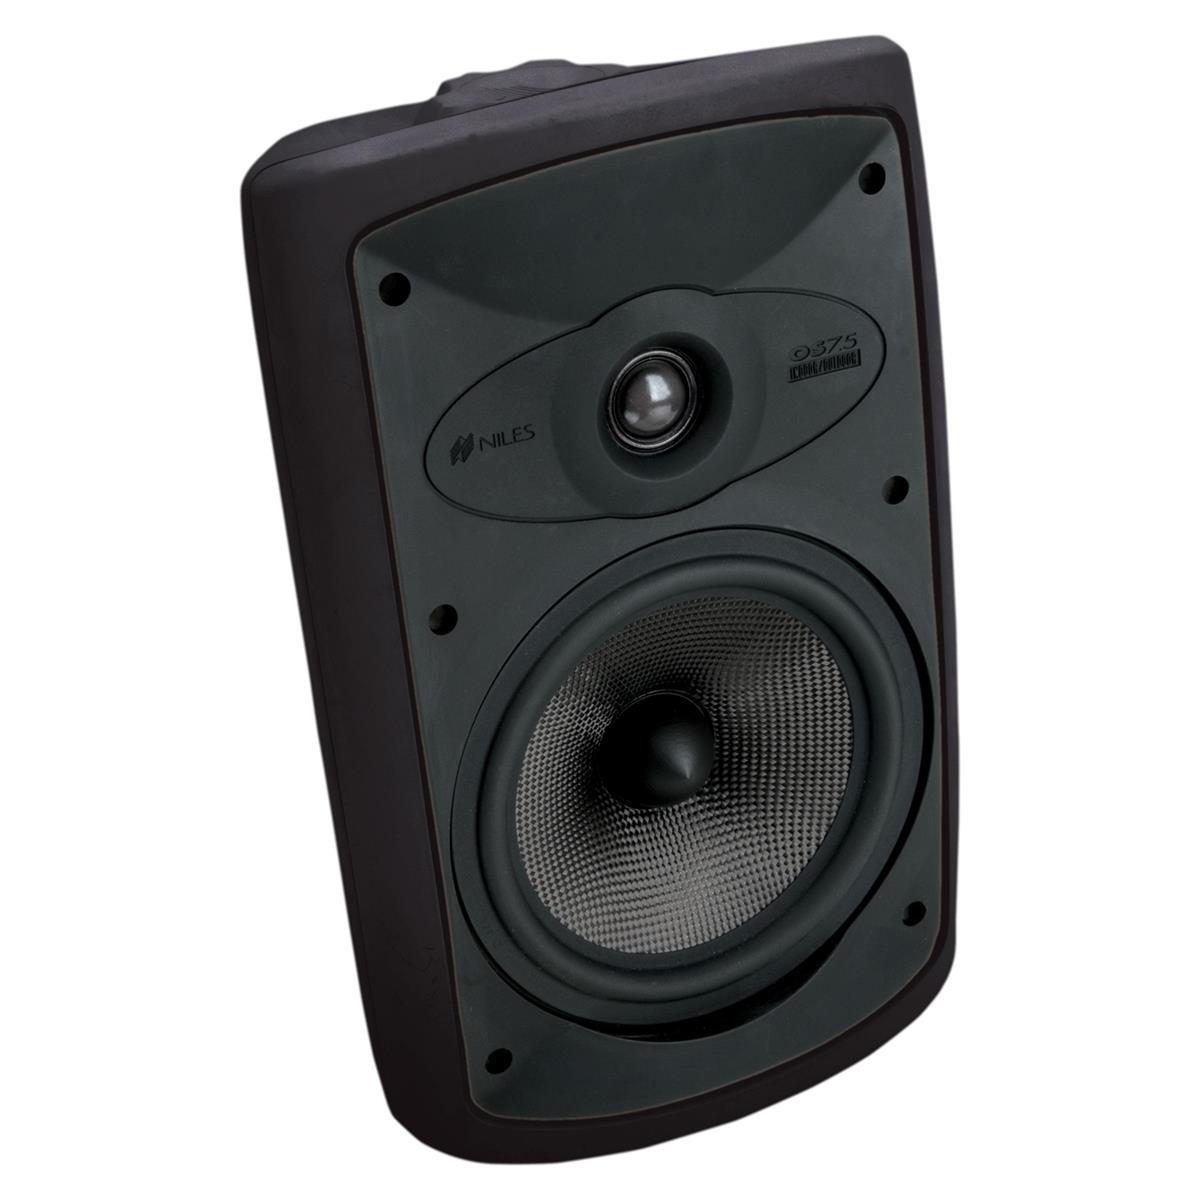 Niles OS7.5 Black (Pr) 7 Inch 2-Way High Performance Indoor Outdoor Speakers (FG00997)